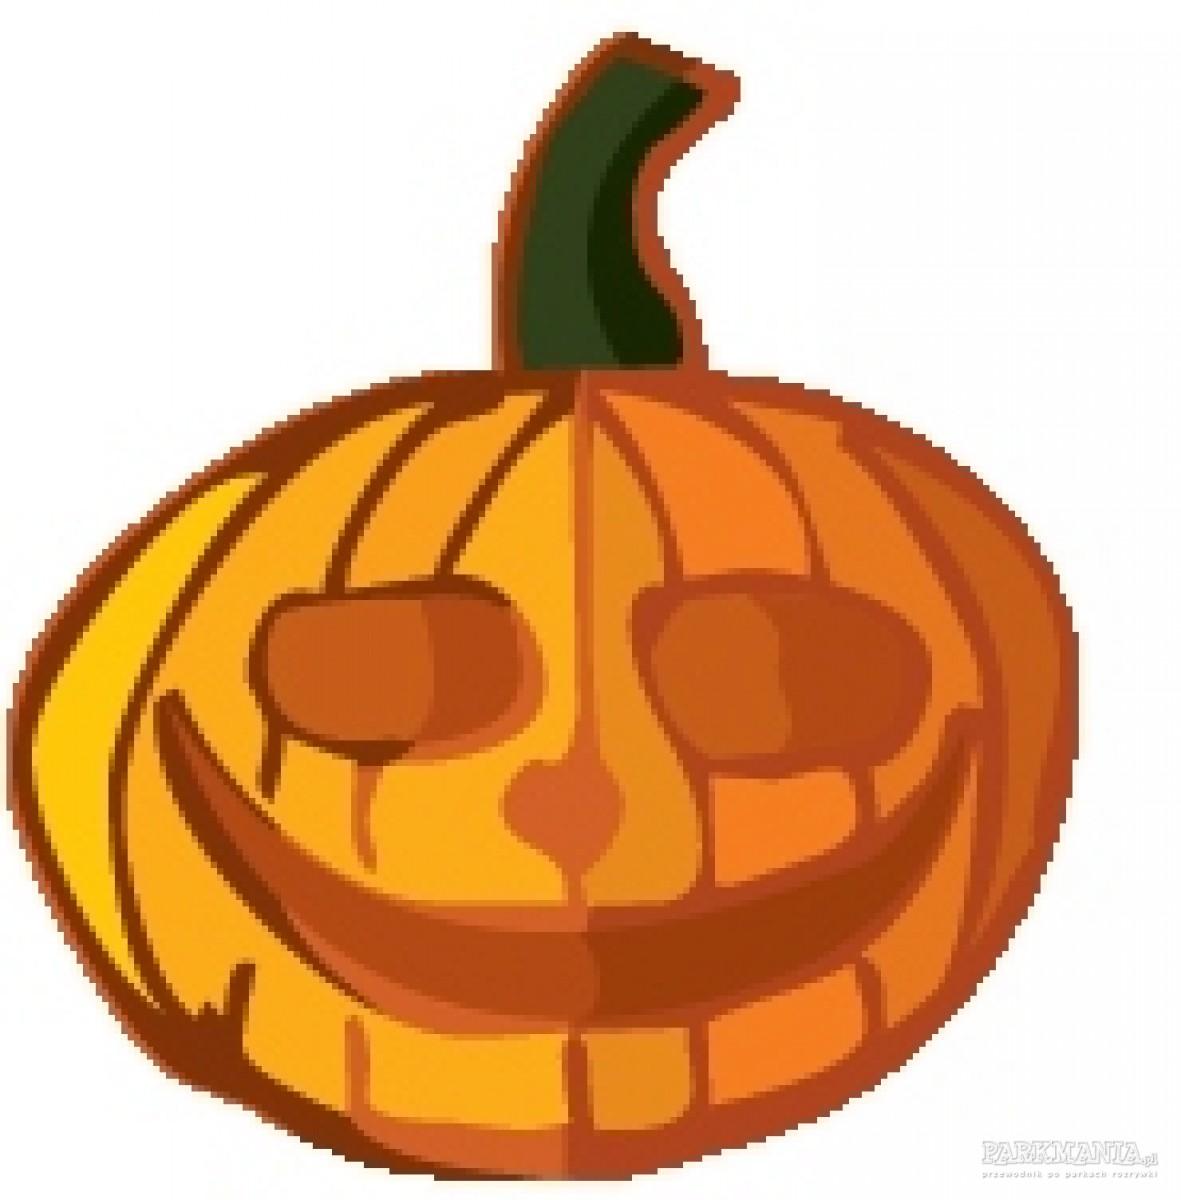 Upiorny weekend Halloween w Jupi Parku